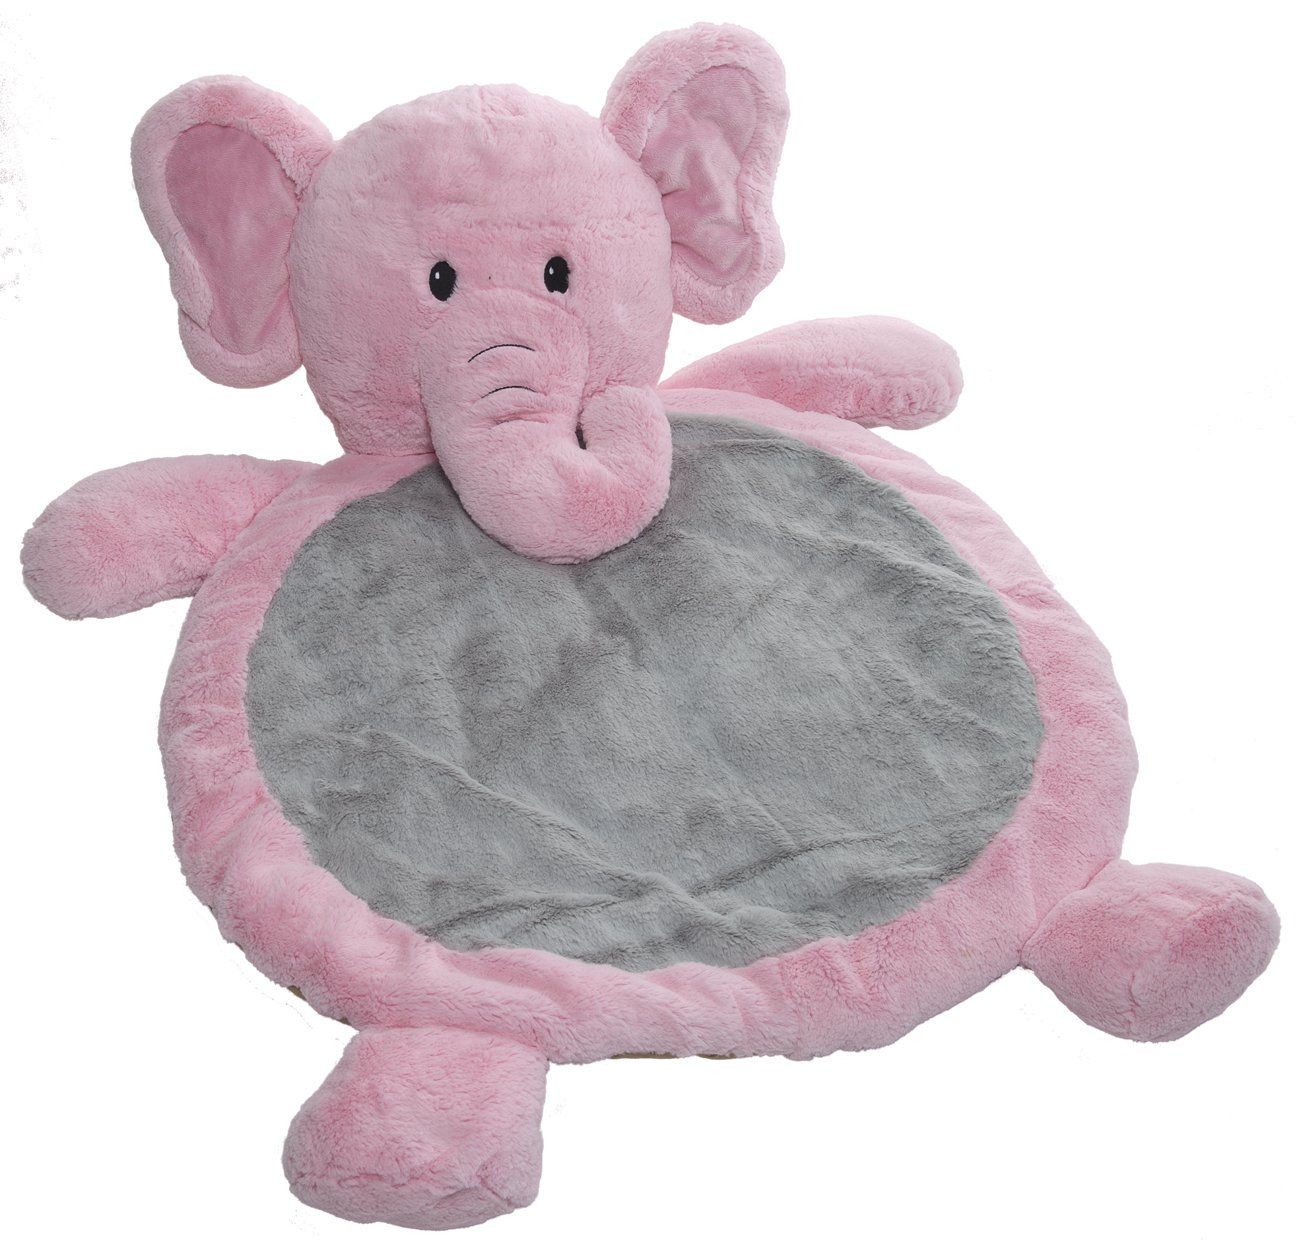 amazoncom  mary meyer bestever baby mat elephant pink  early  - amazoncom  mary meyer bestever baby mat elephant pink  earlydevelopment playmats  baby